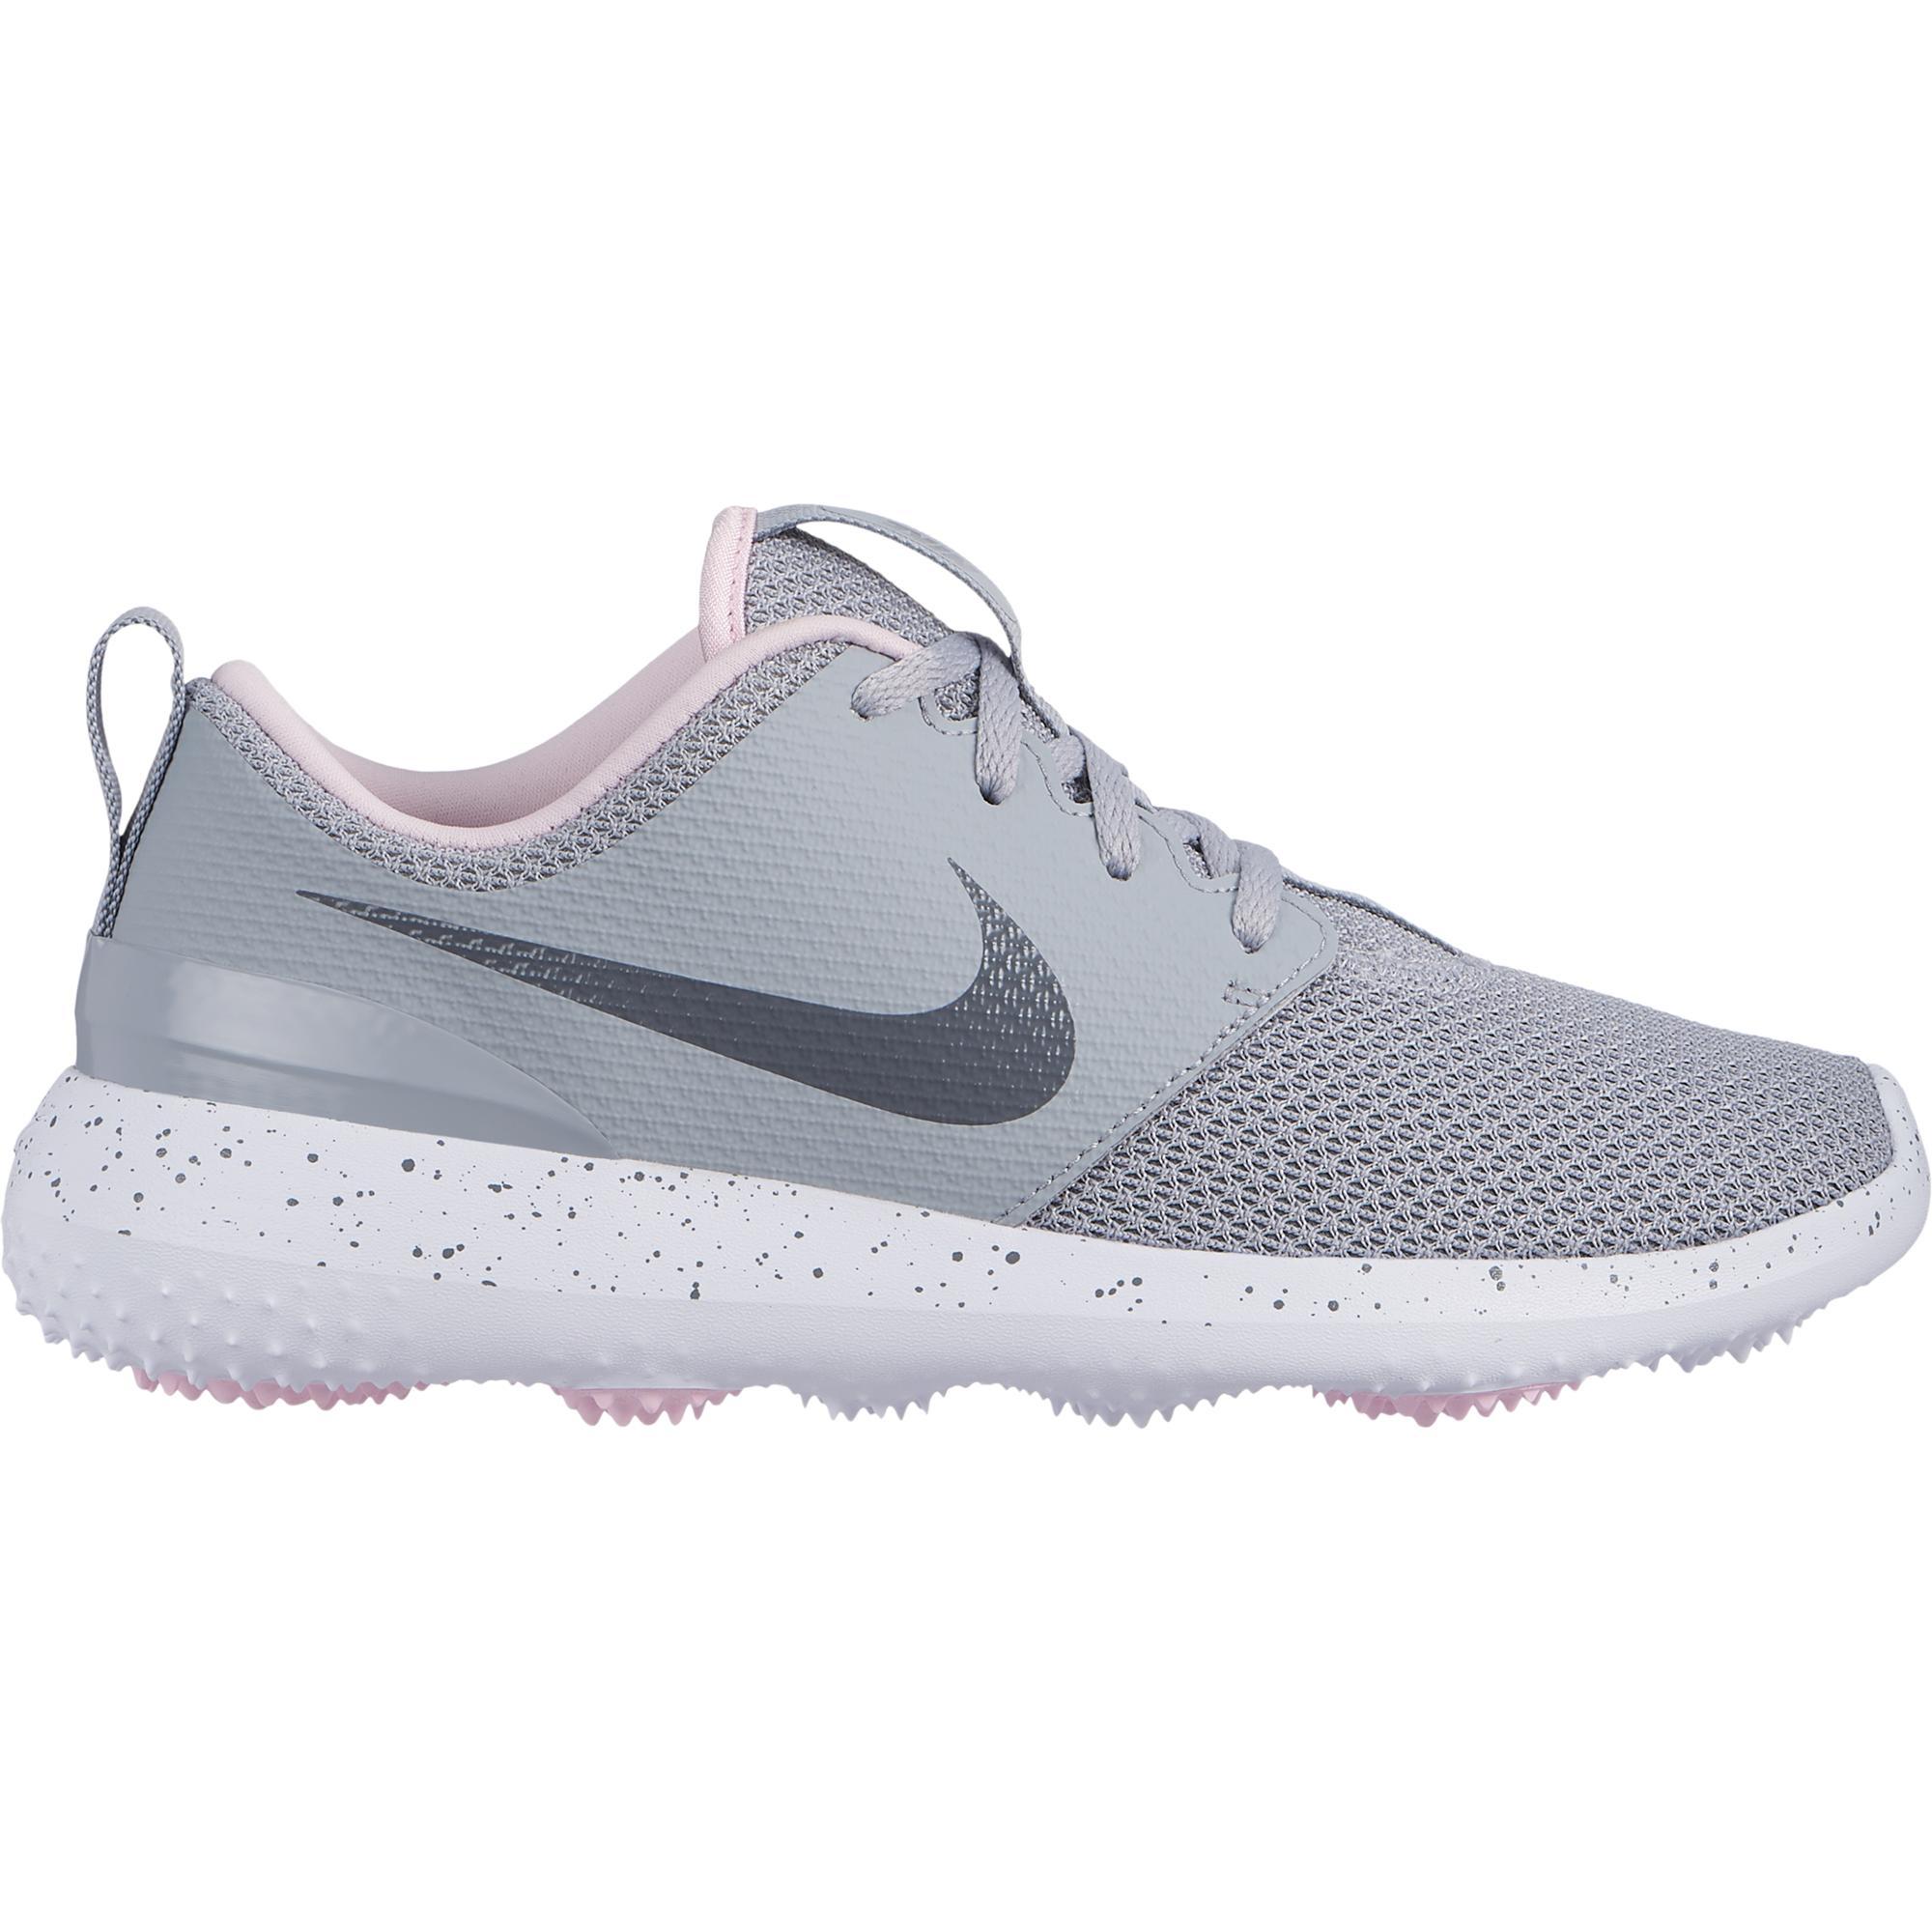 Women's Roshe G Spikeless Golf Shoe - GREY/LIGHT PINK